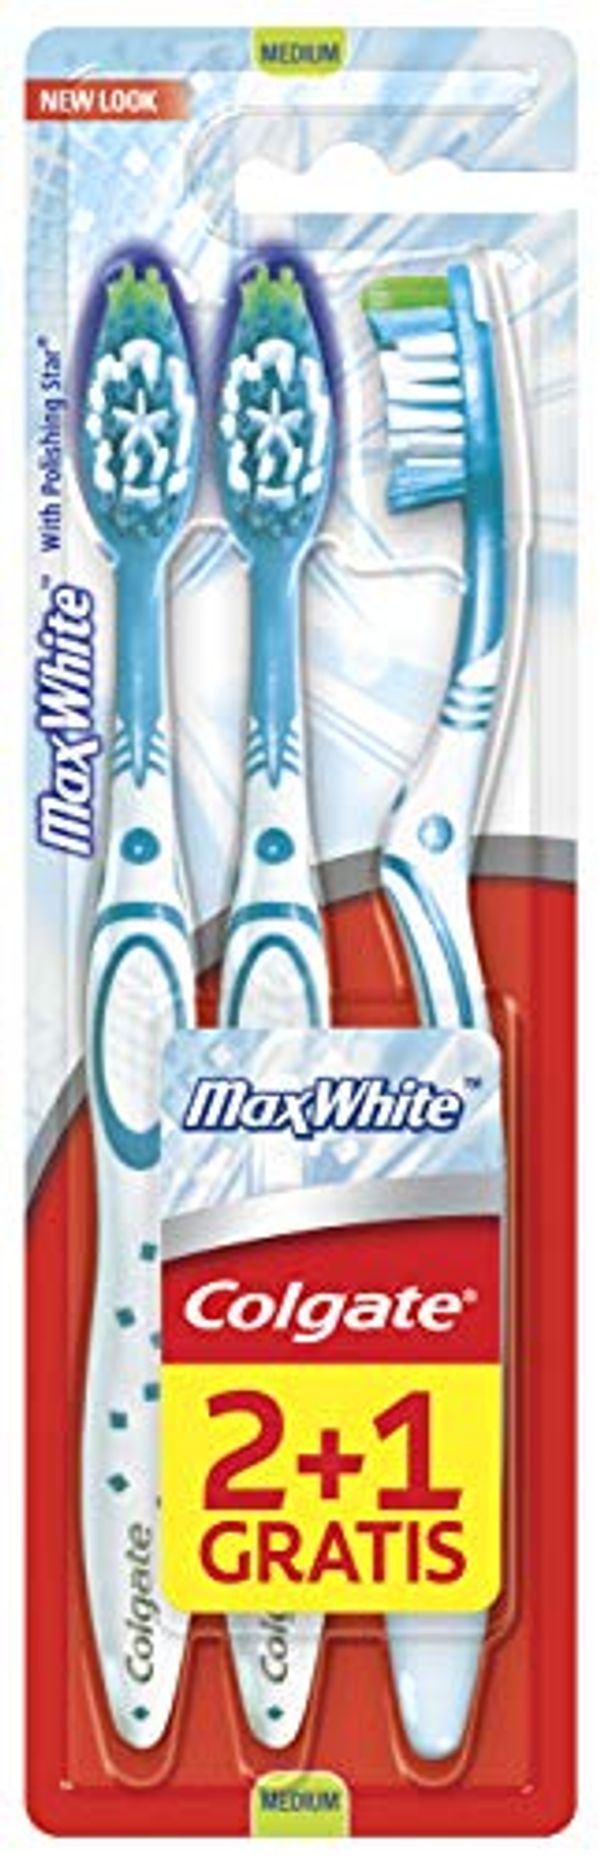 HALF PRICE! Colgate Max White Medium Toothbrush x3